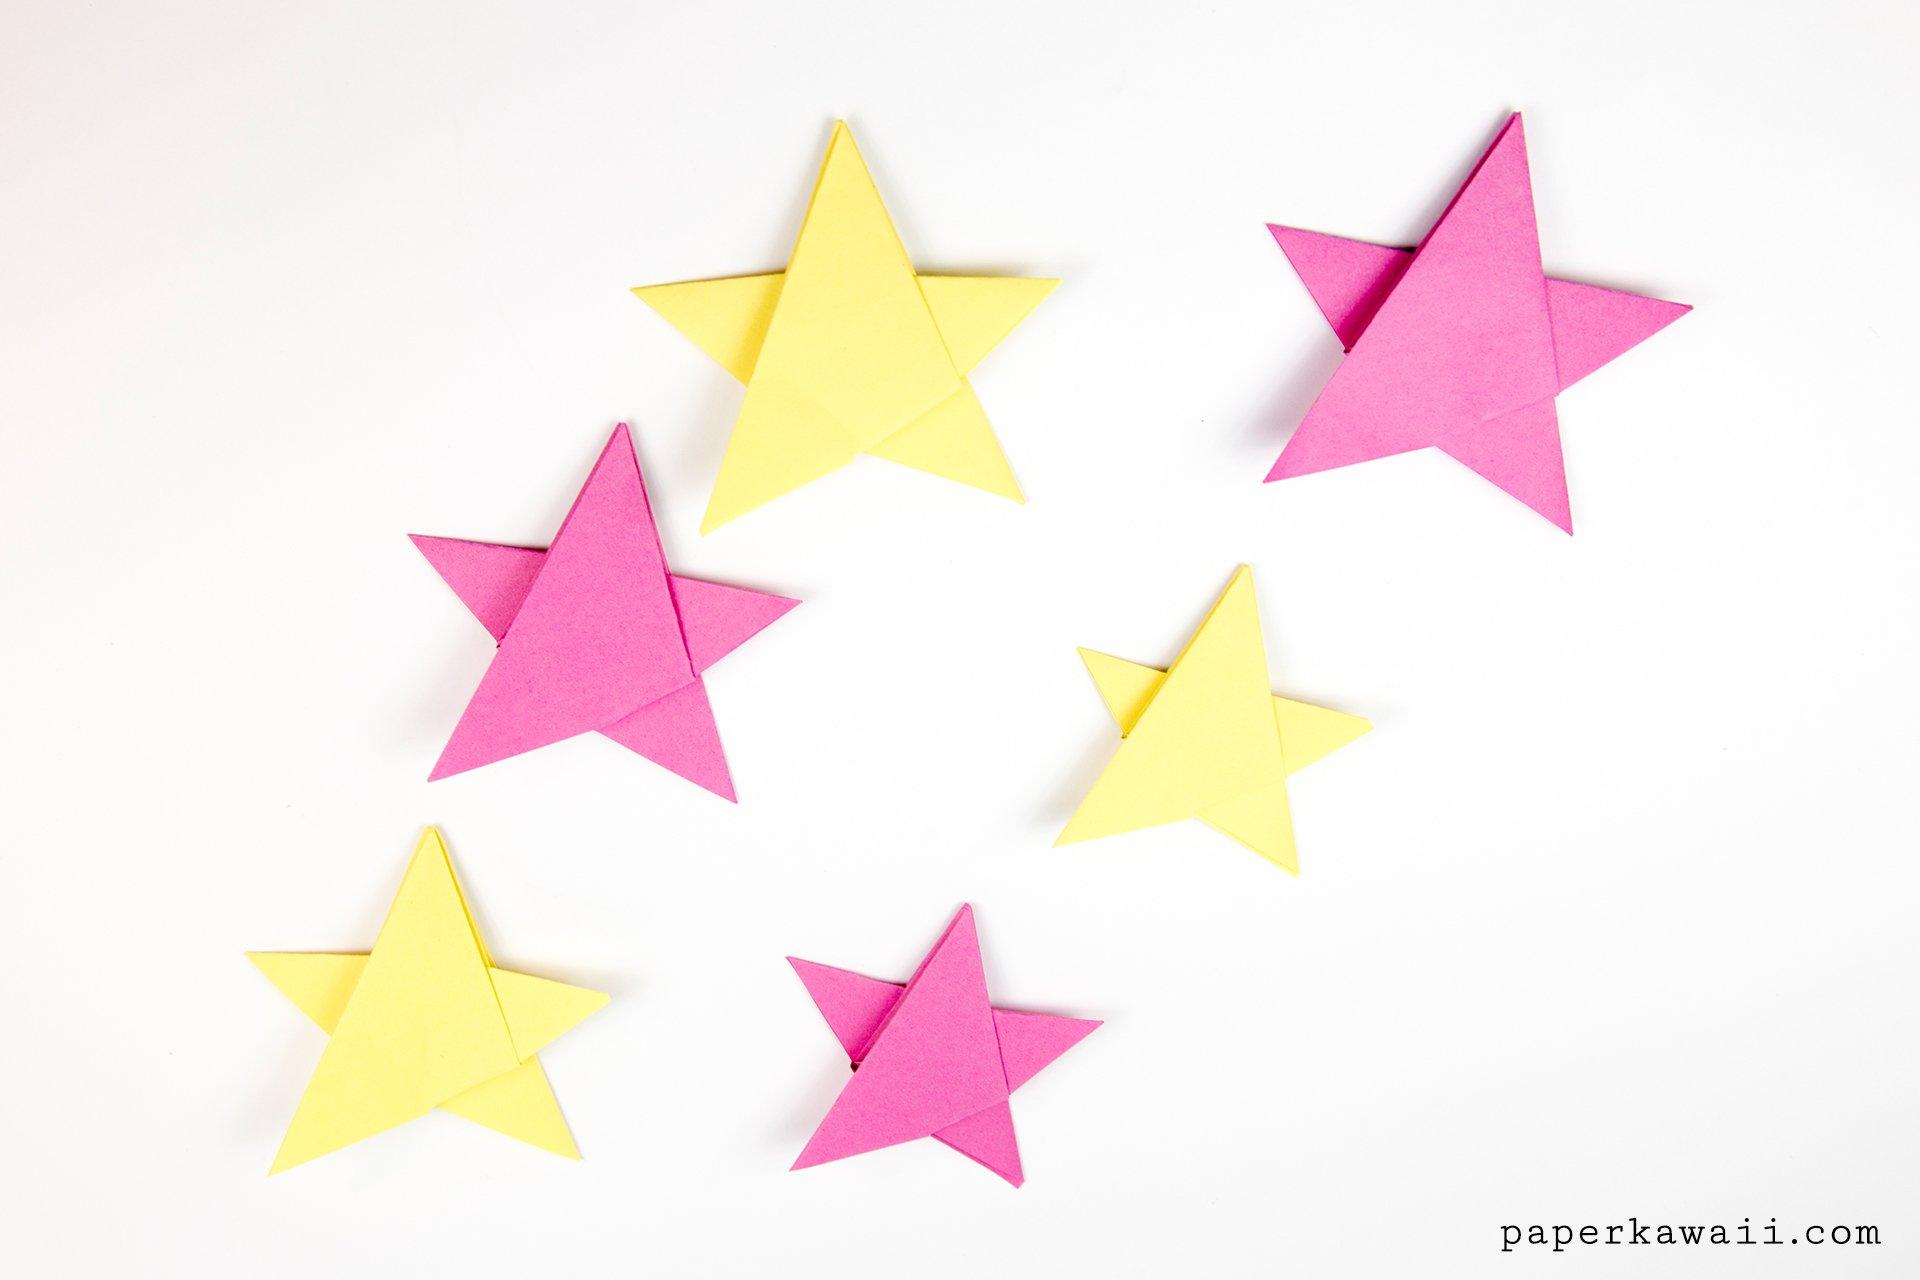 Simple Origami 5 Point Star Tutorial 1 Sheet Paper Kawaii